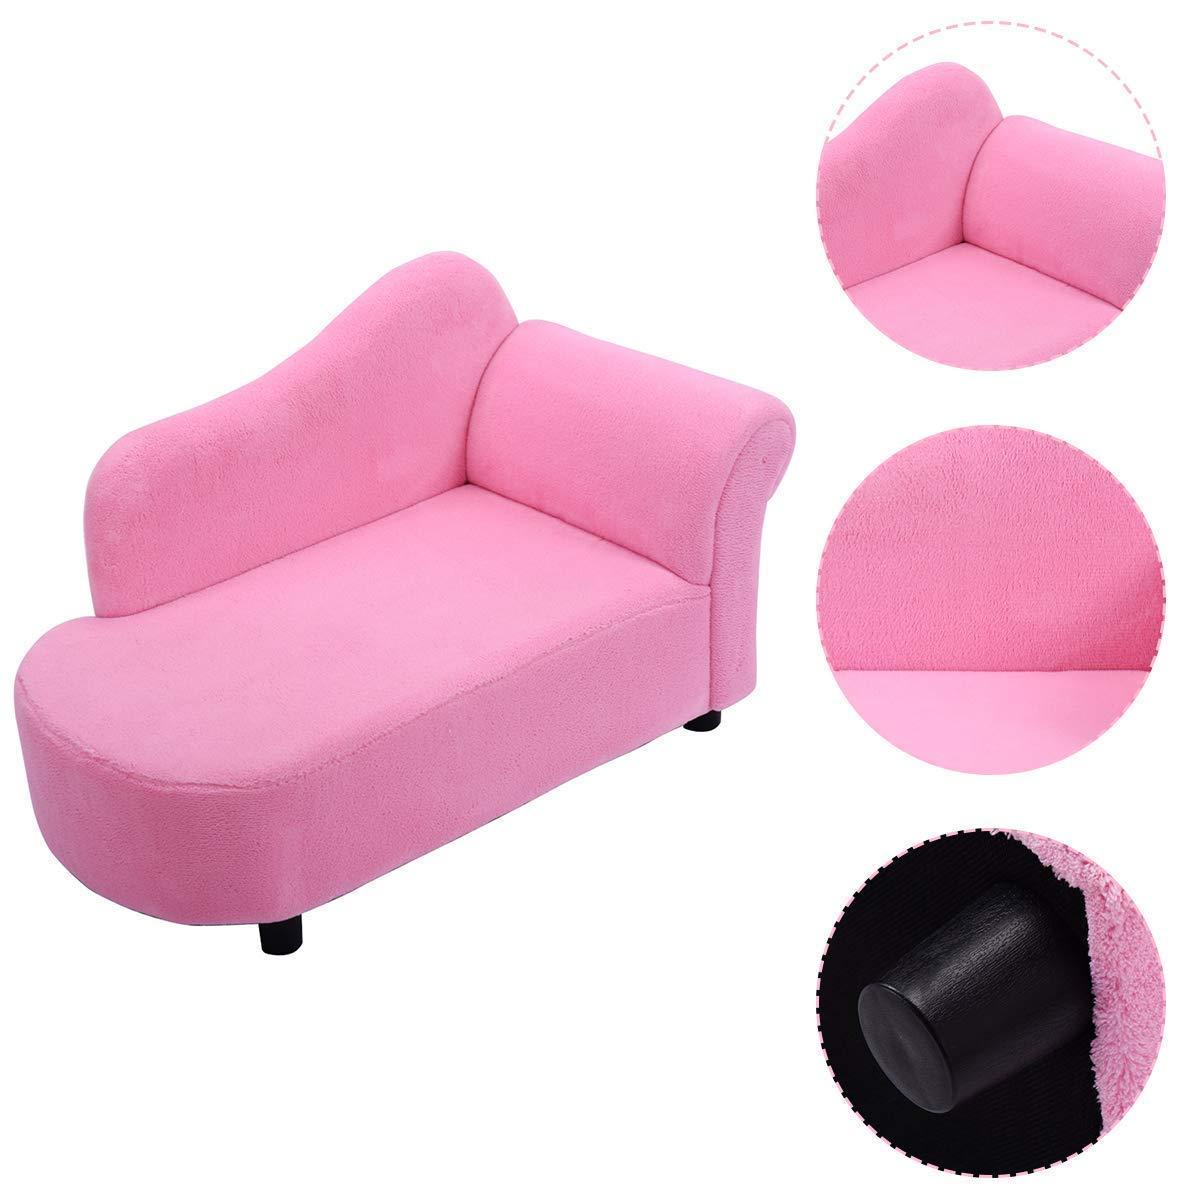 Amazon.com: HONEY JOY Kids Chaise Lounge Sofa Couch Set ...